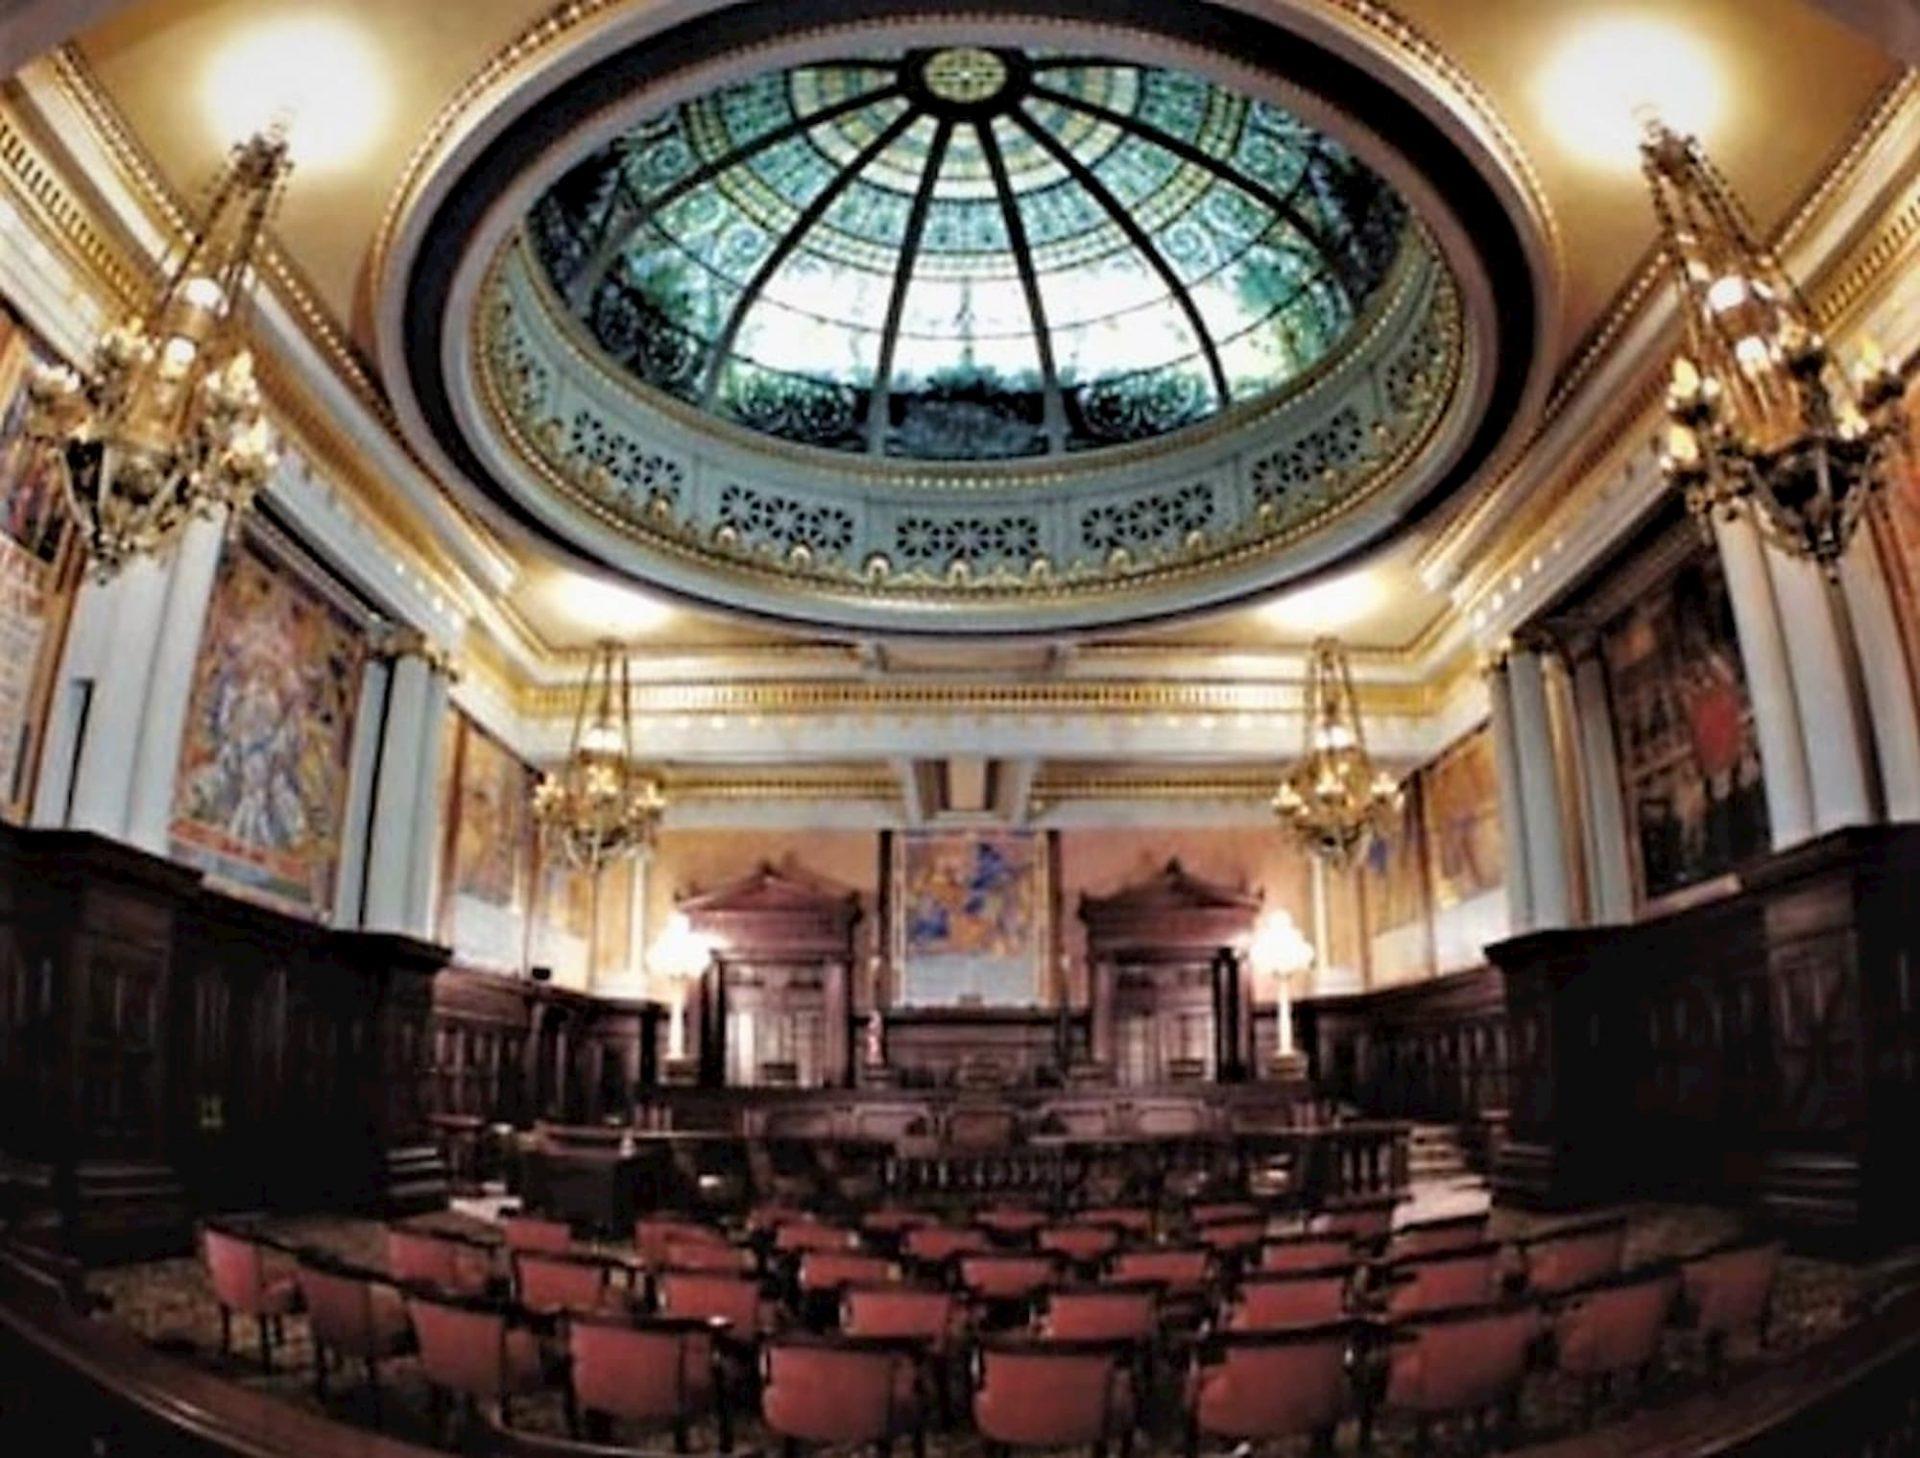 PA Capitol Supreme Court Room